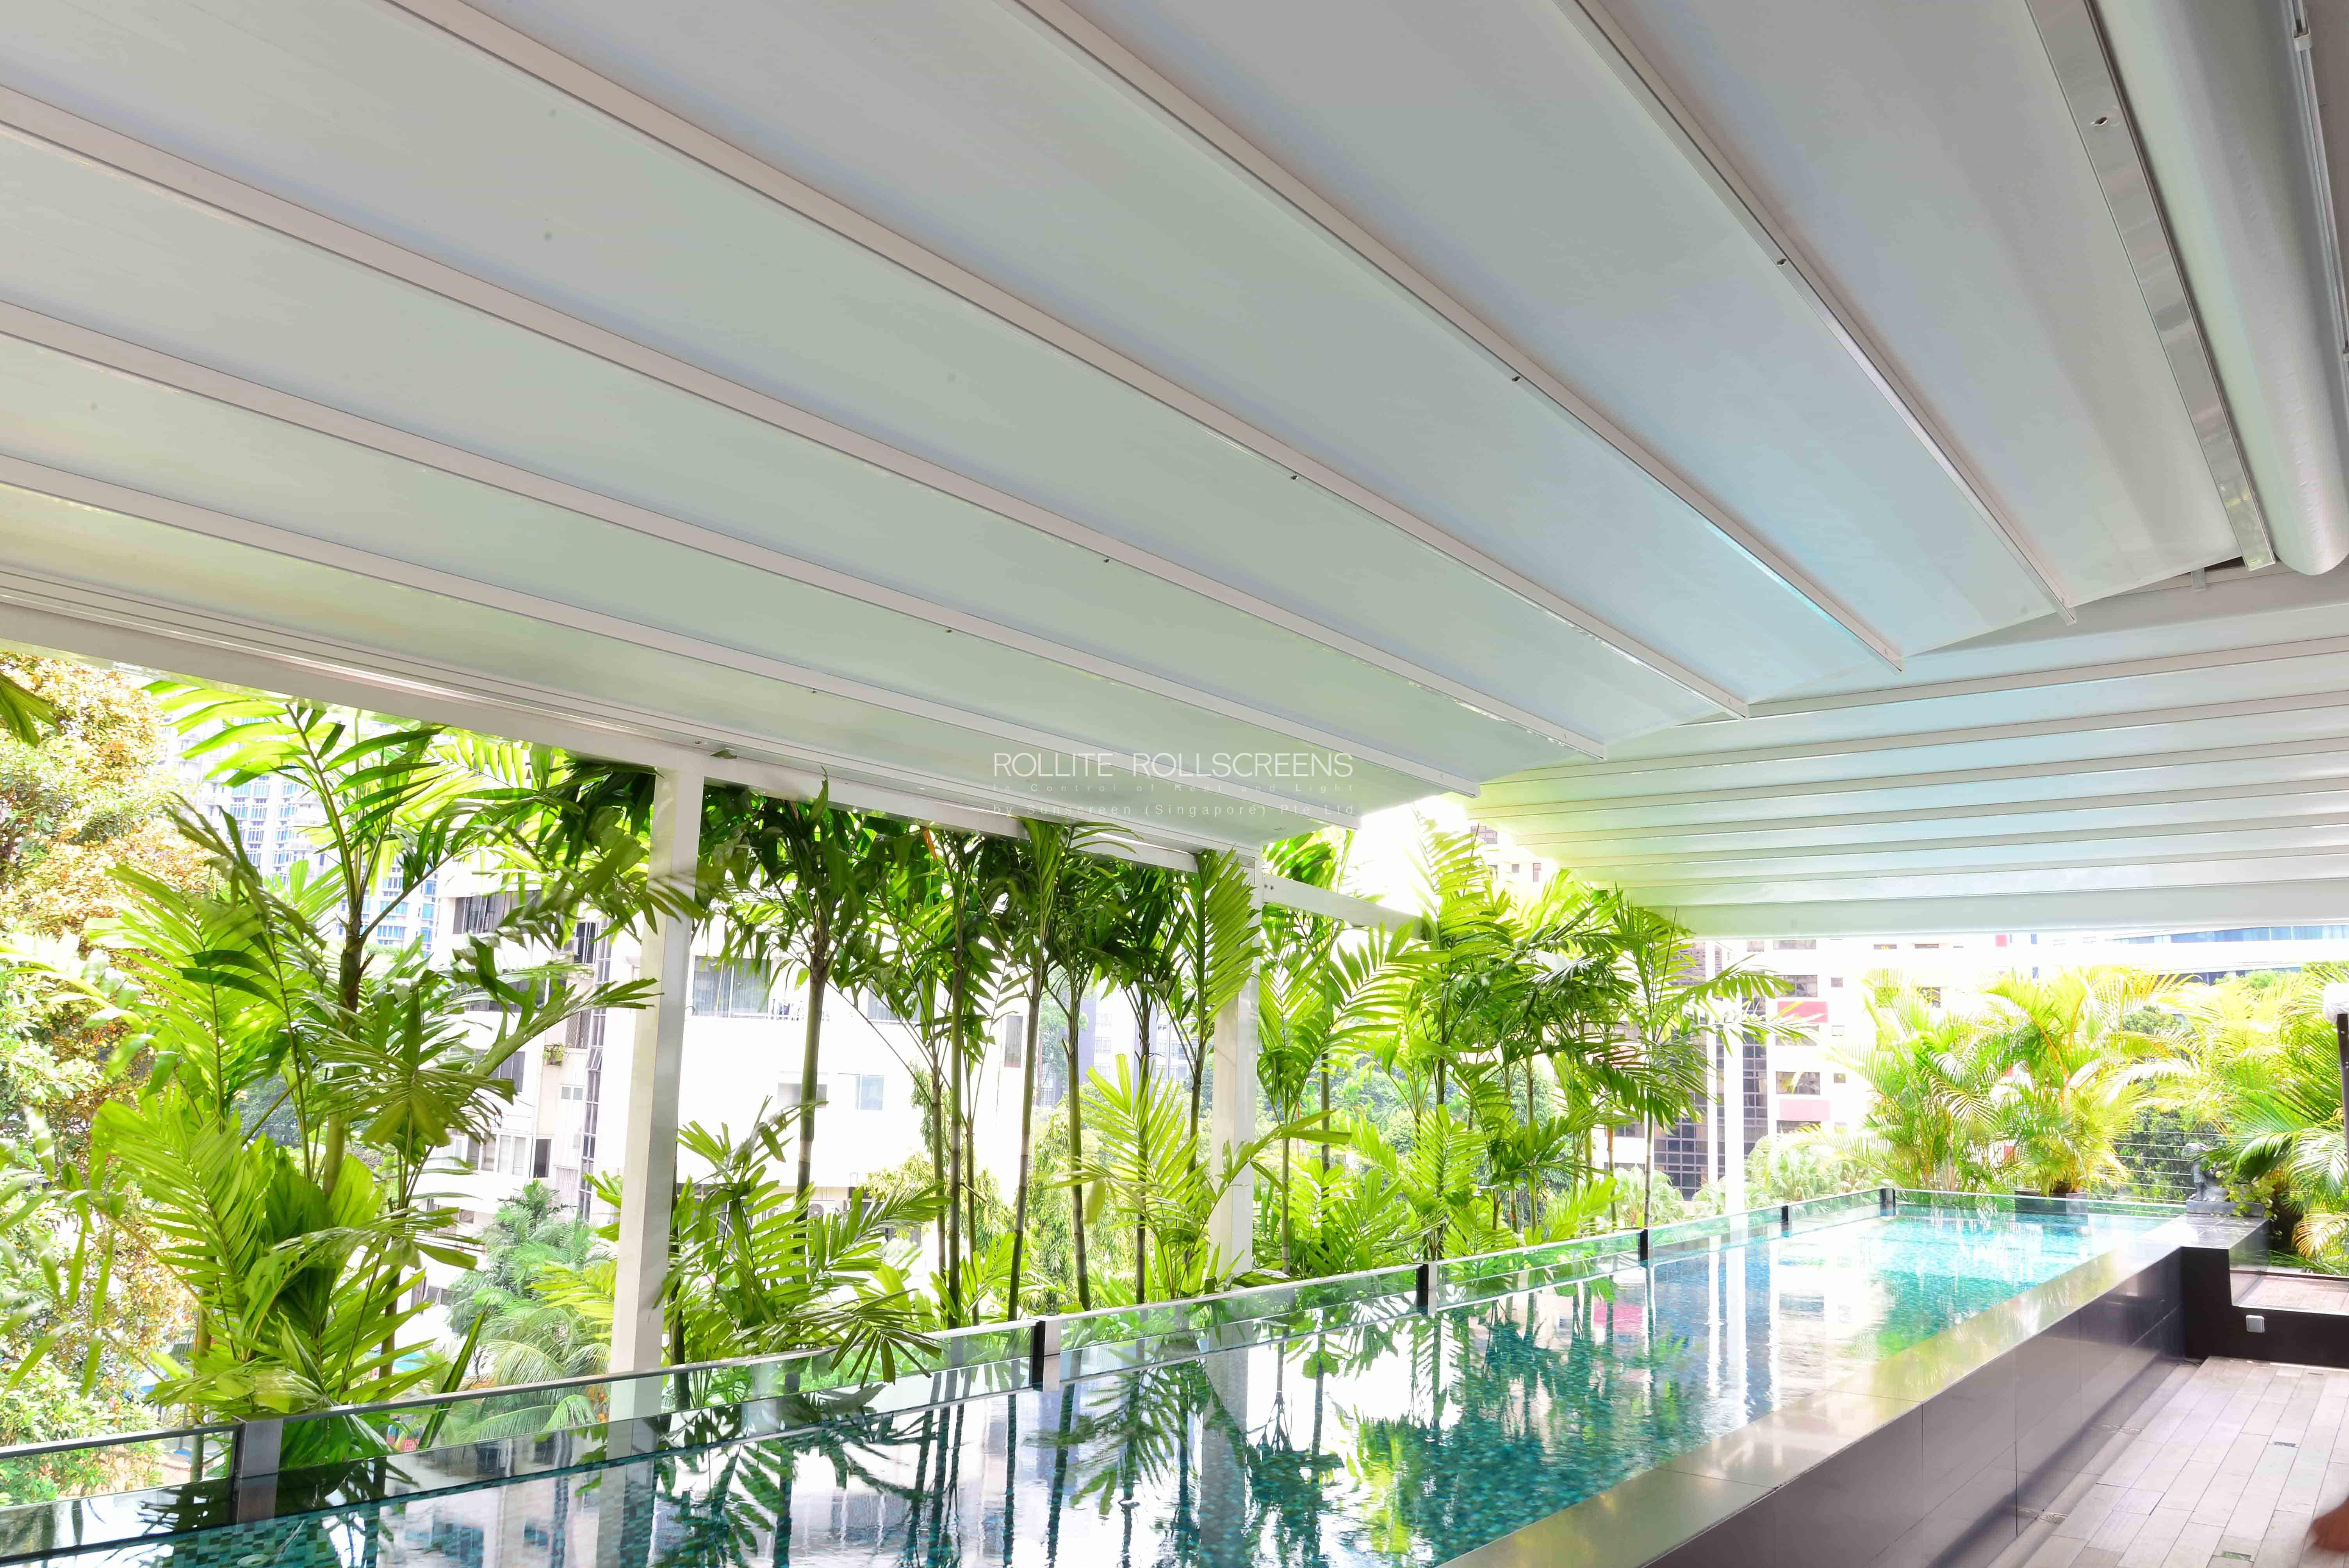 Sunscreen-Singapore_Rollite-Outdoor-33